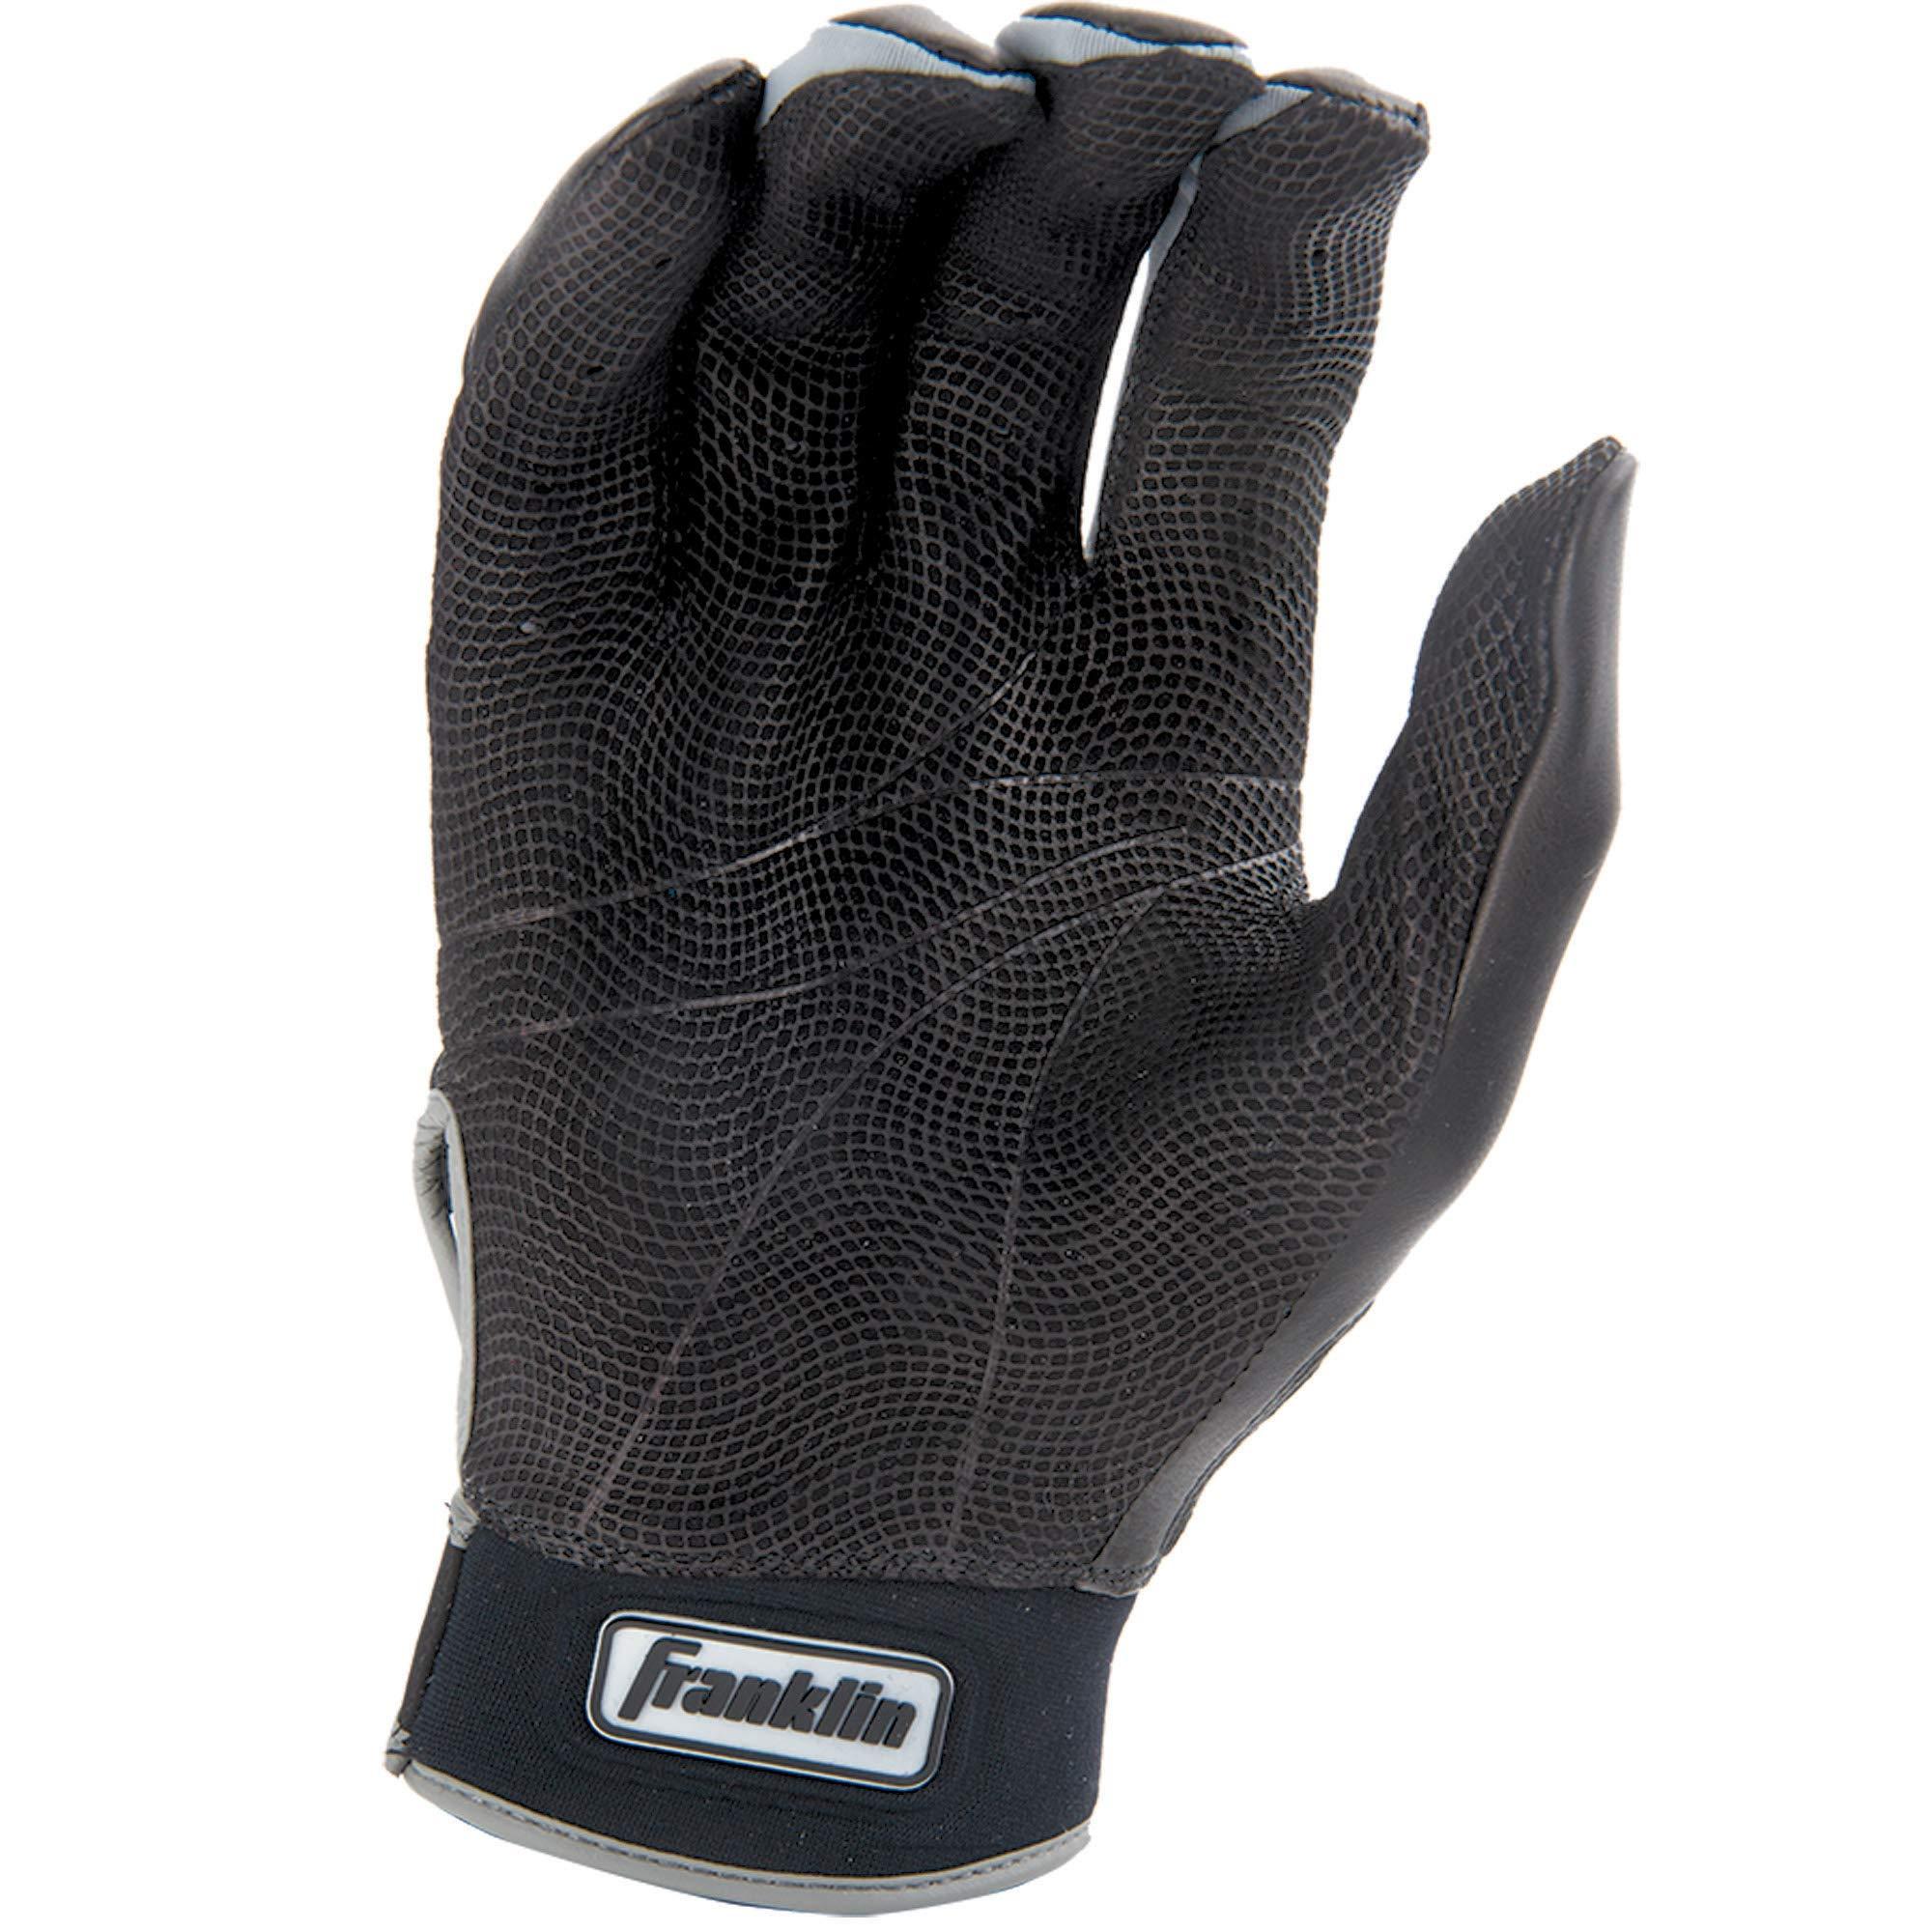 Franklin Sports MLB CFX Pro Batting Gloves, Black/Black (2015) by Franklin Sports (Image #4)